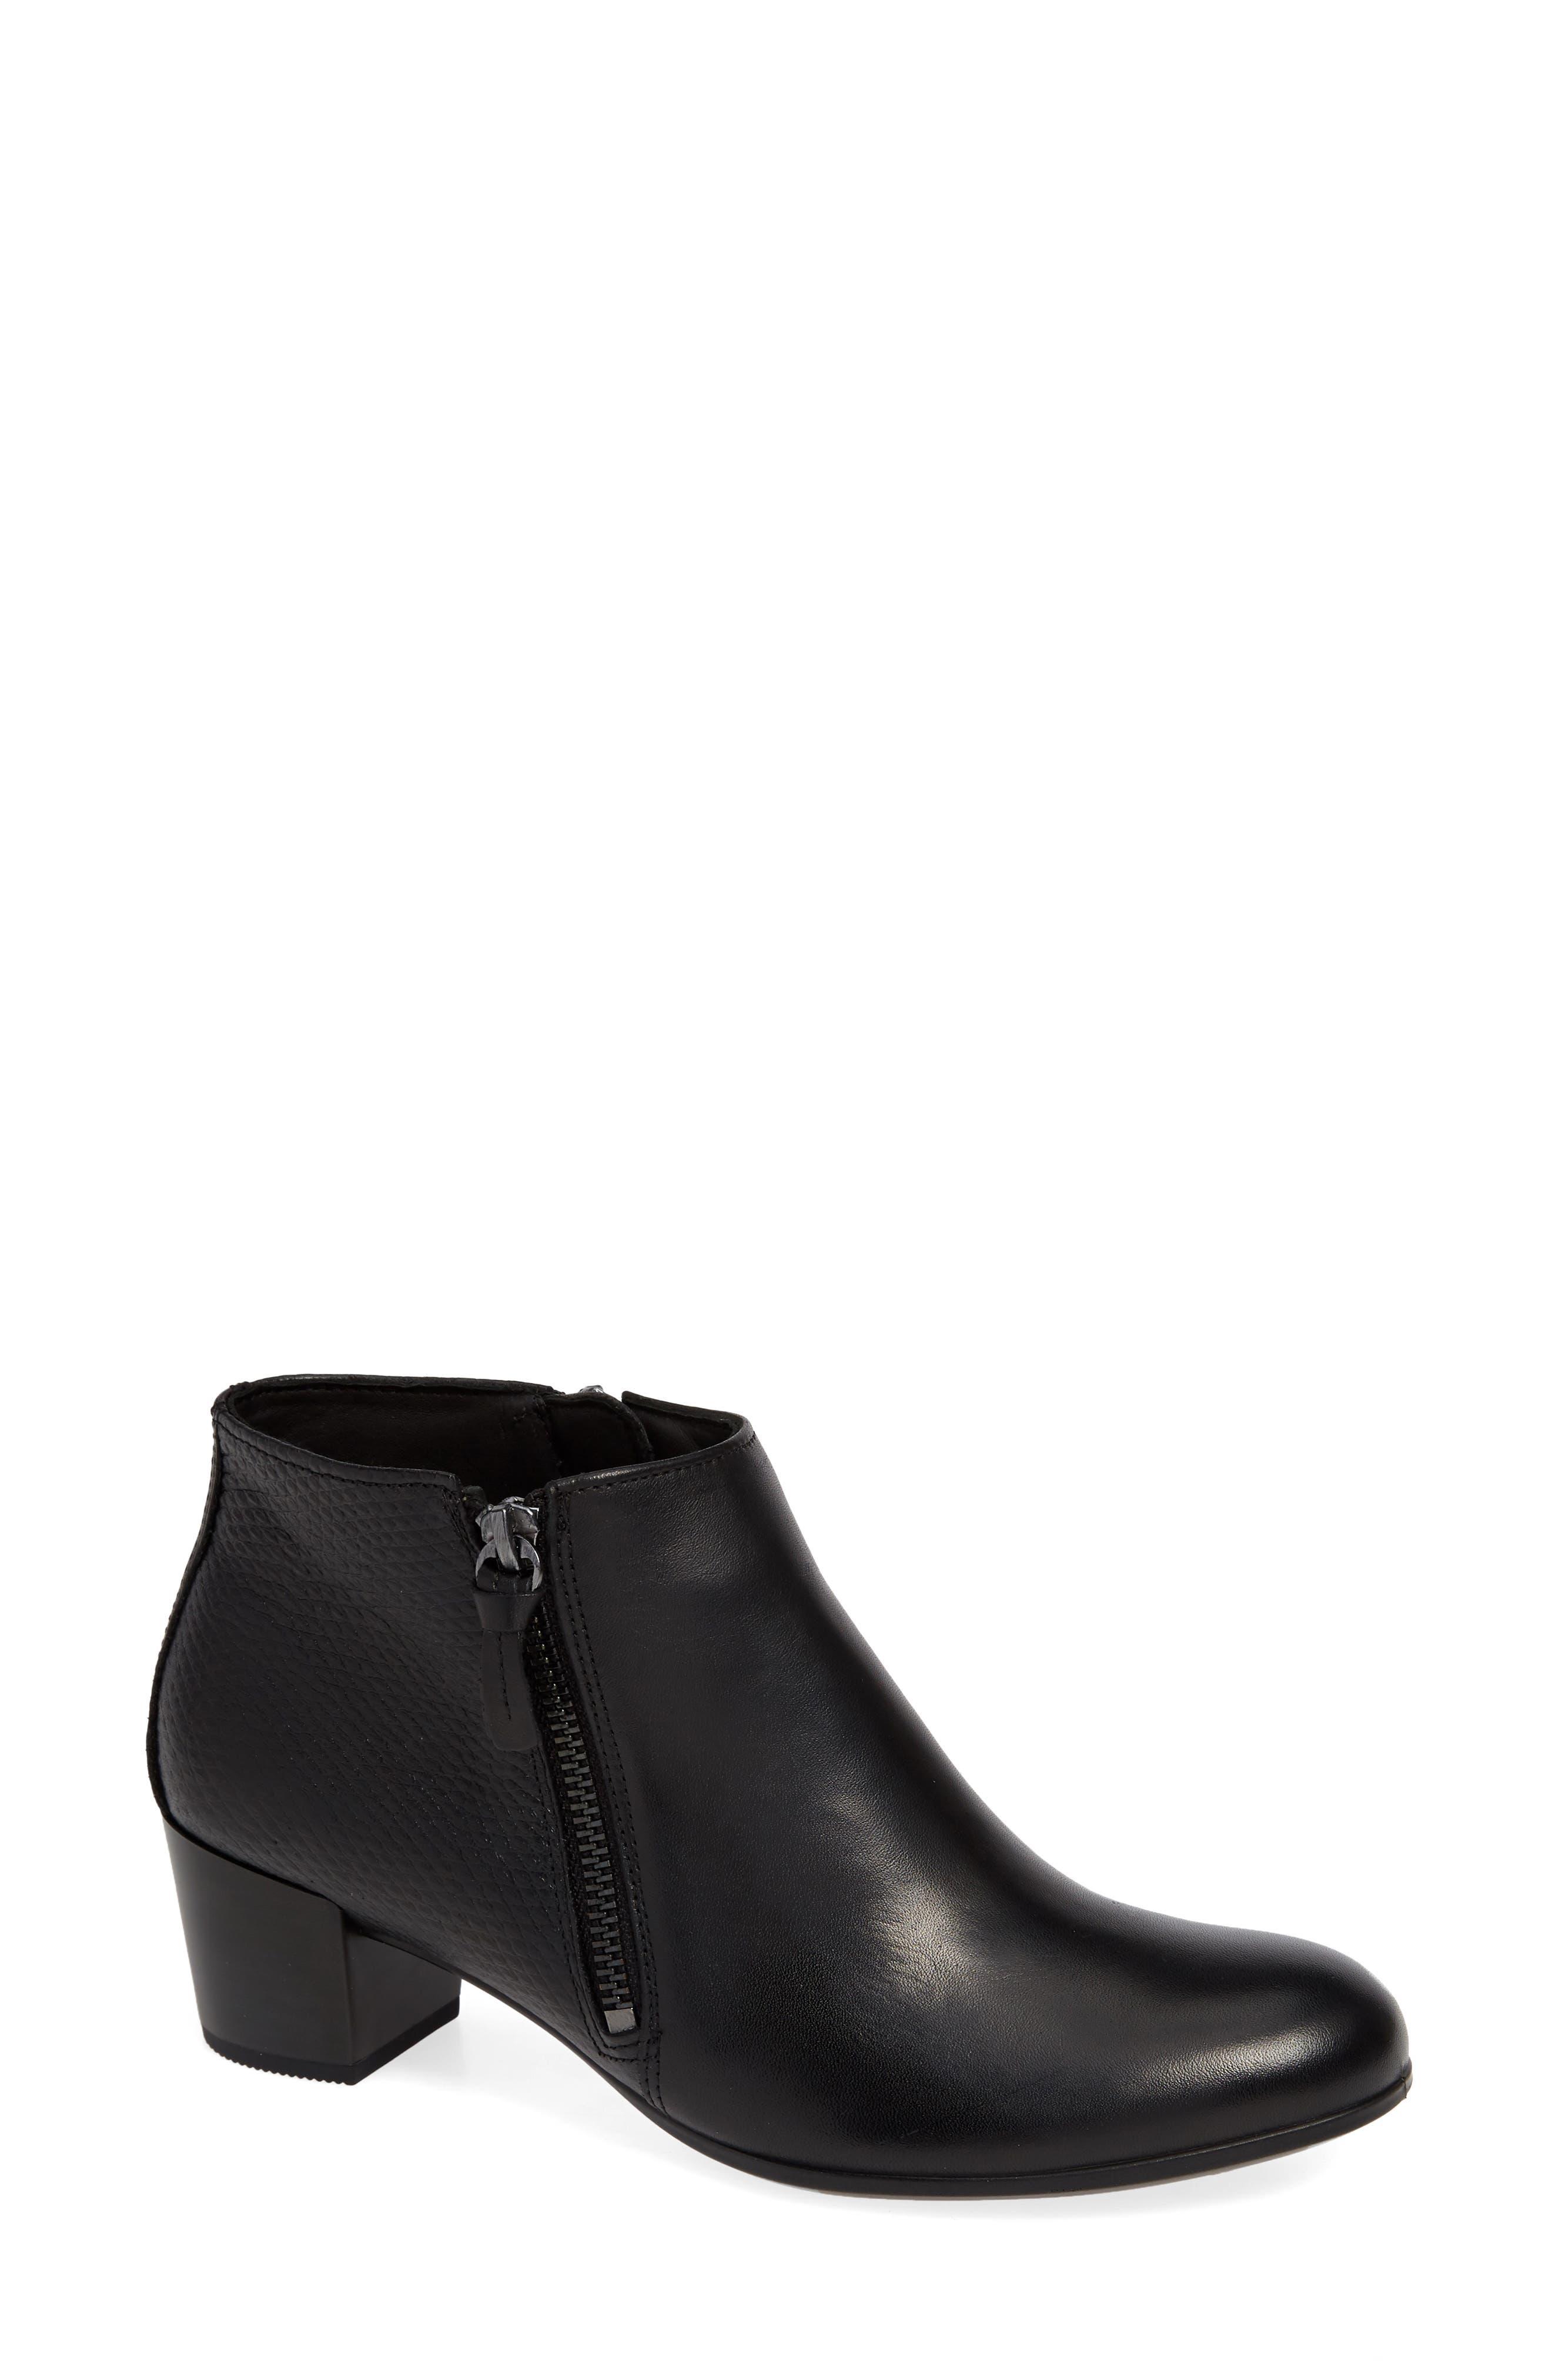 Shape 35 Ankle Bootie, Main, color, BLACK LEATHER